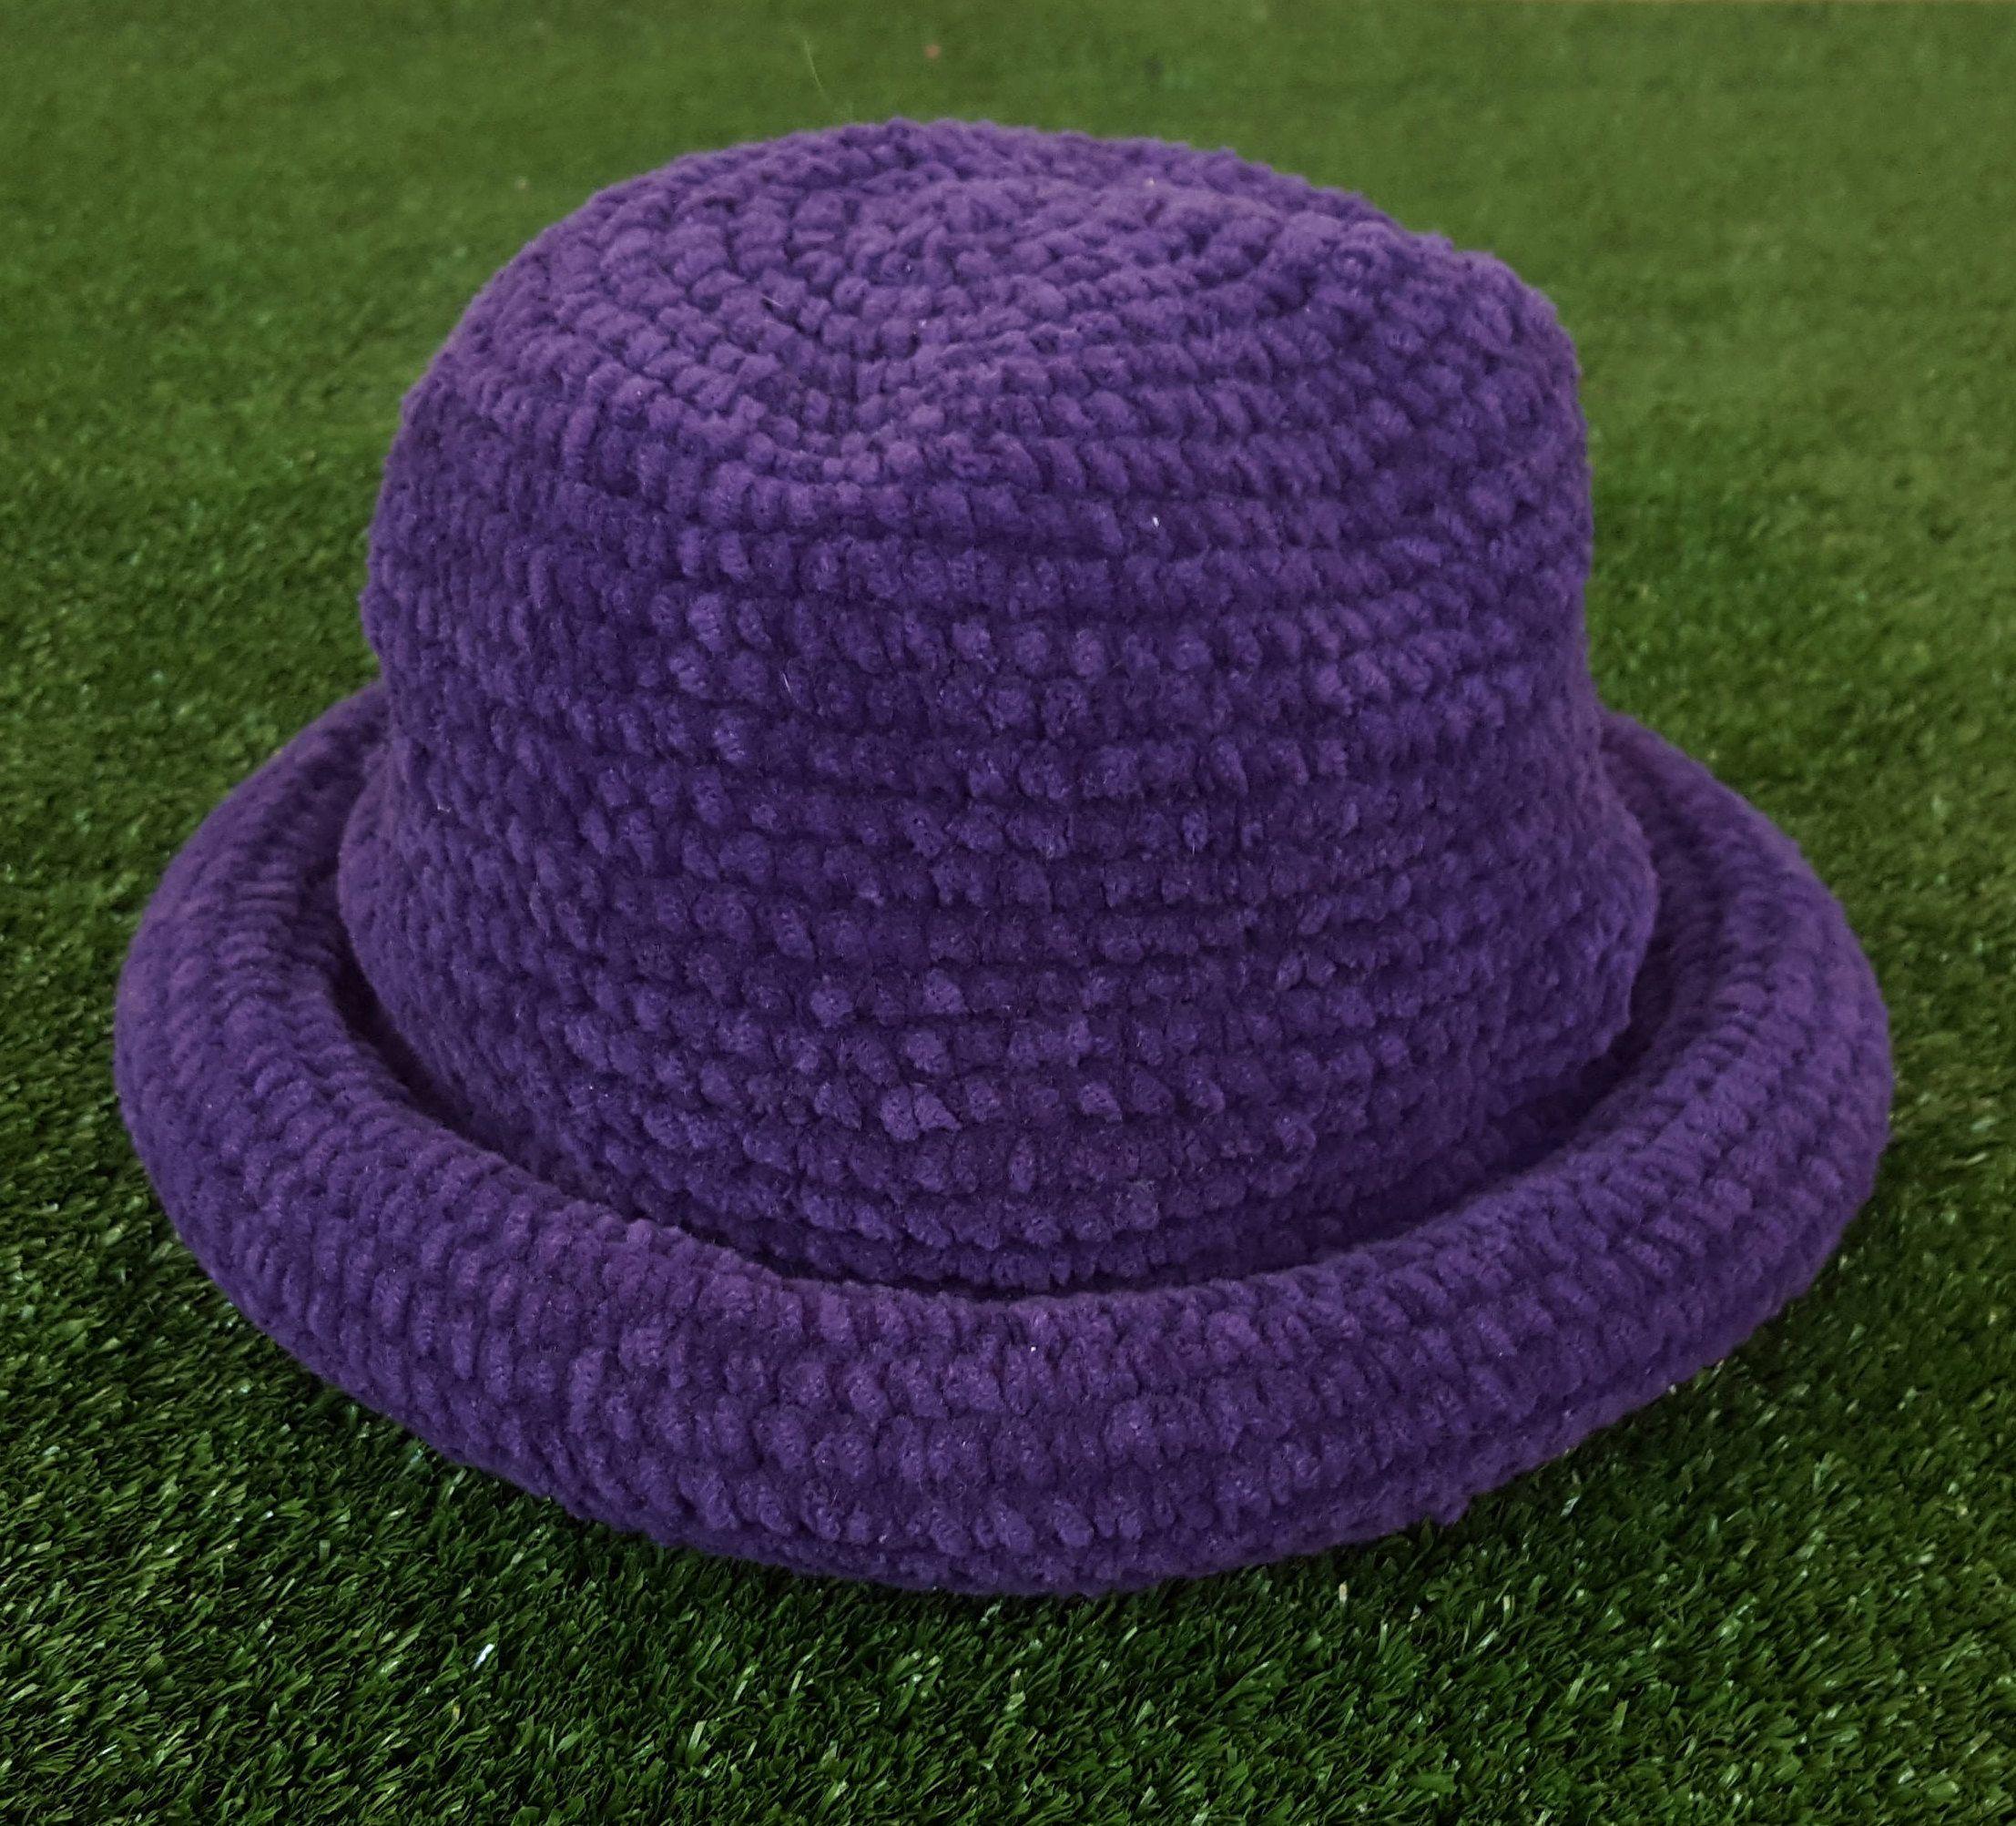 f5f032f123e Vintage 90 s Purple Bucket Hat   Floppy Crocheted   Dad Hat   Festival Gear    Vintage   Purple   by NEONPOINT on Etsy